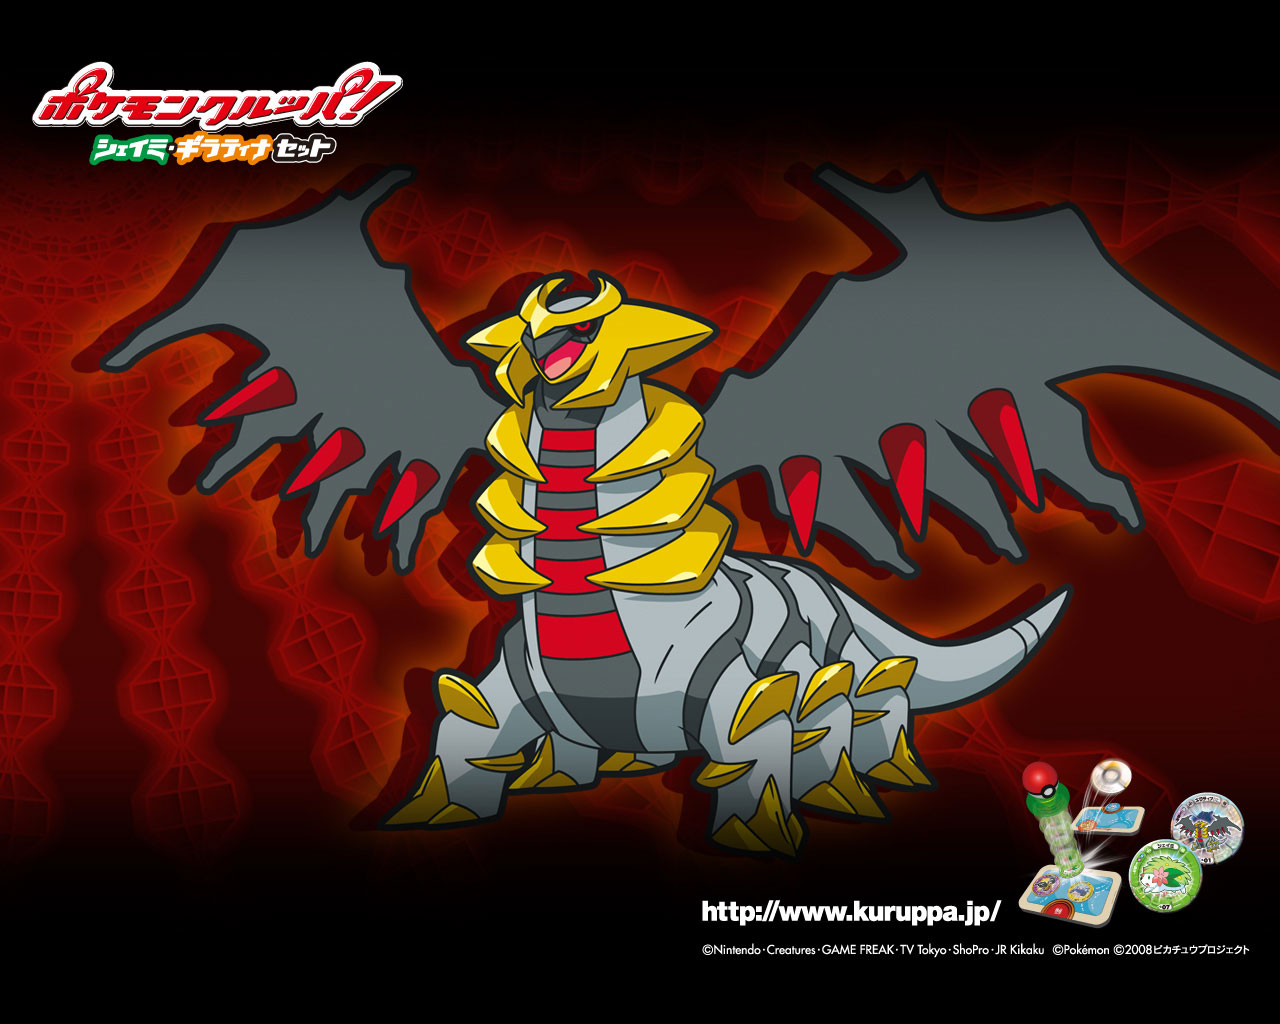 http://3.bp.blogspot.com/-PPF0wQIdgwI/TVfTVjyz0aI/AAAAAAAAAu8/cwHWaNlkfzw/s1600/PokemonWallpaper190.jpg